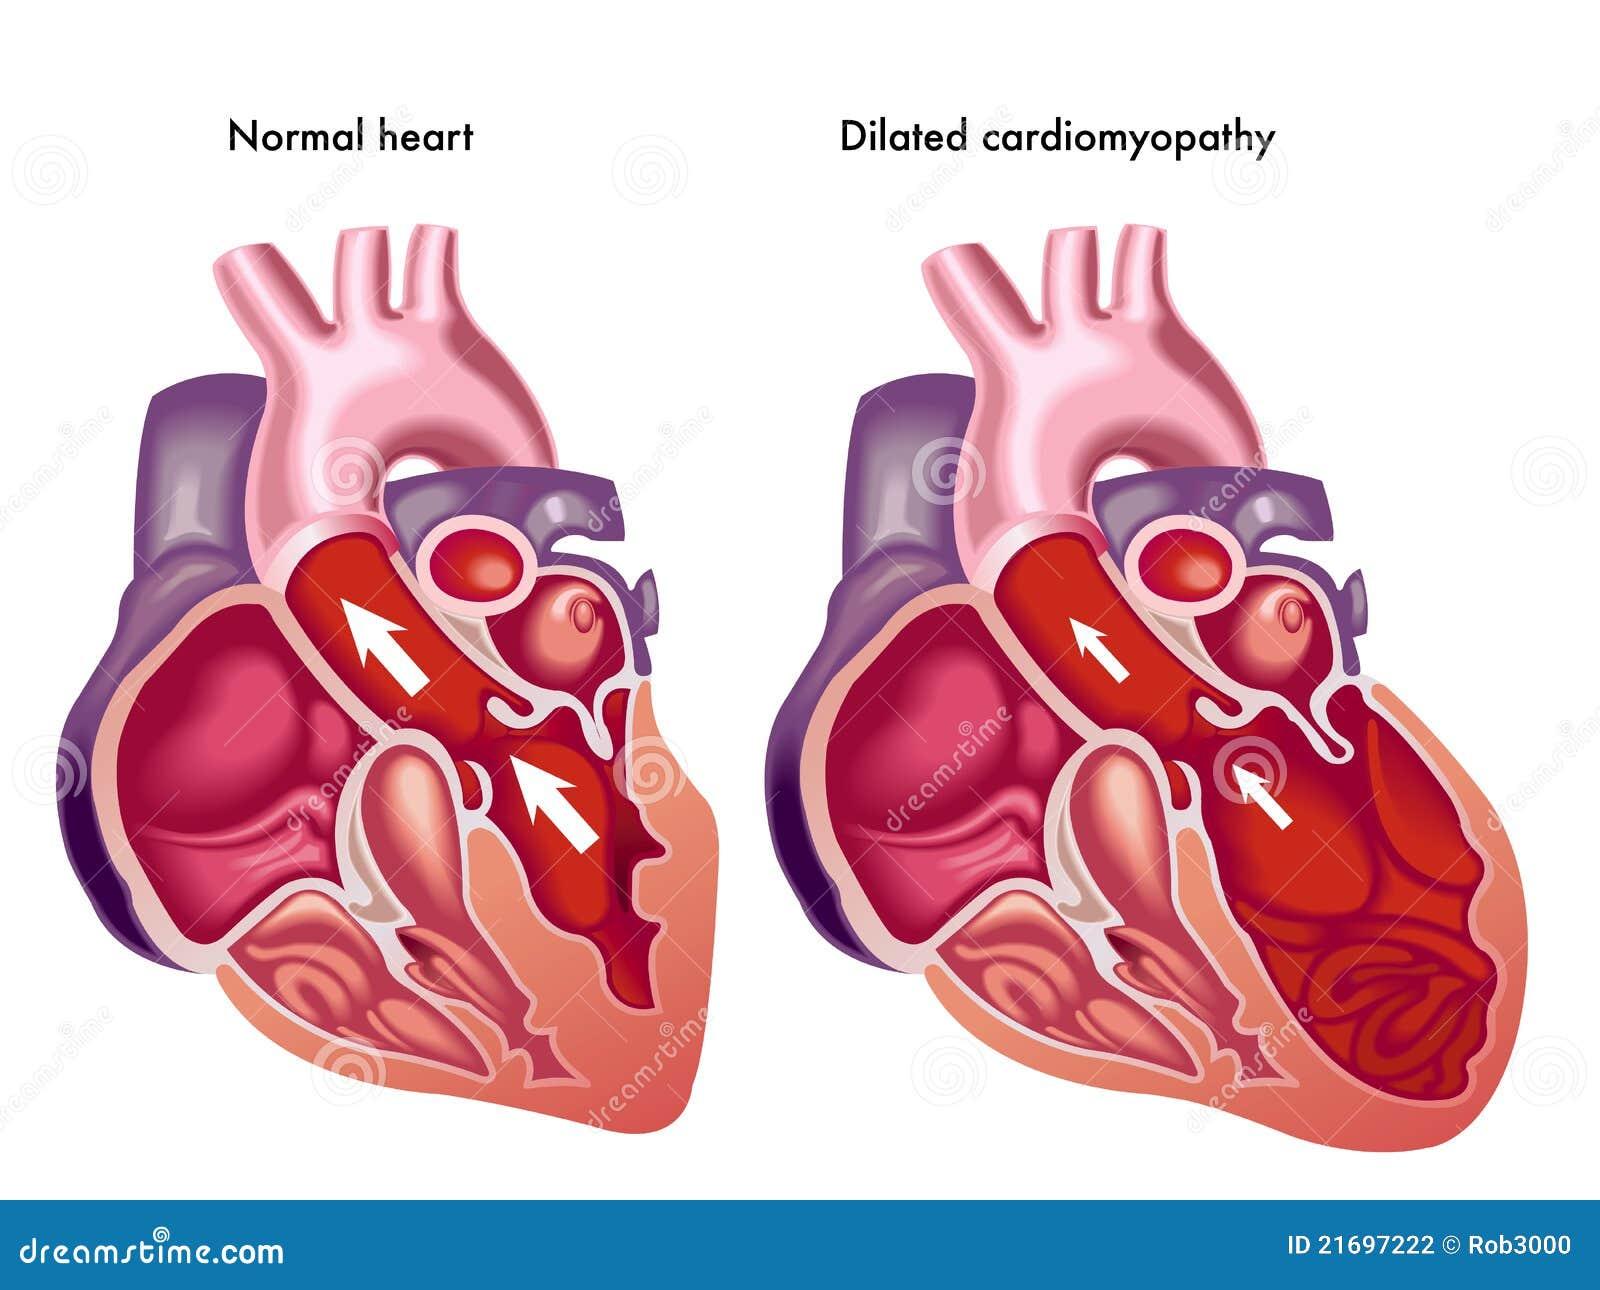 Vidgad cardiomyopathy